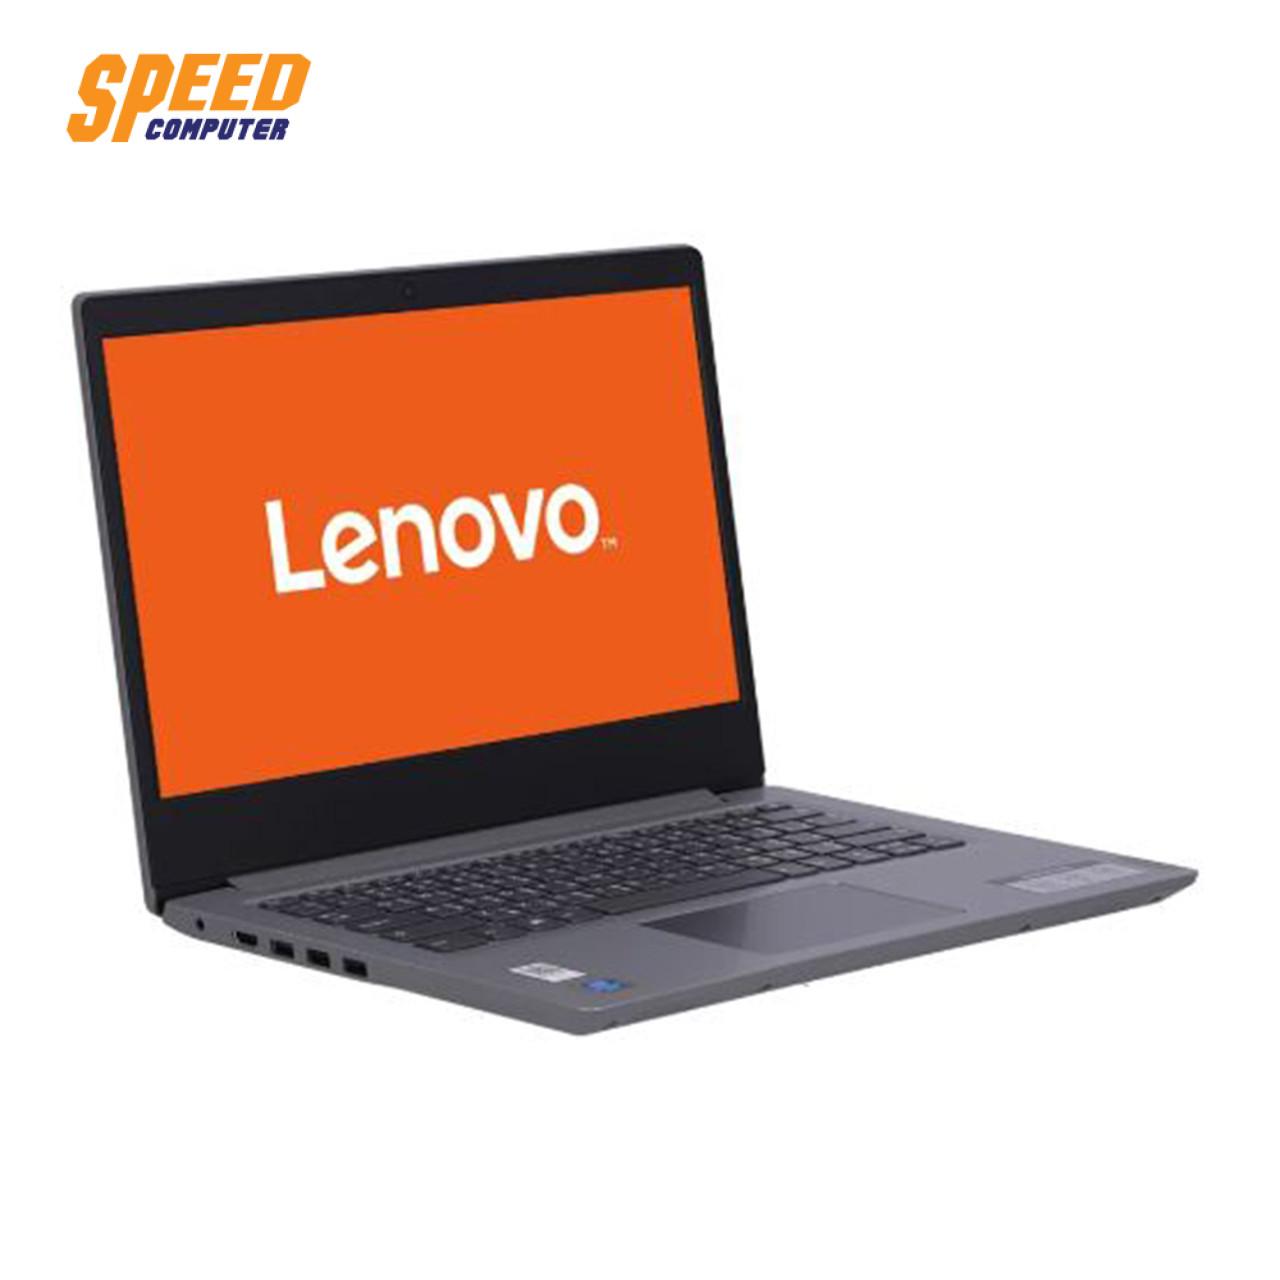 LENOVO S340-14IWL-81N7001QTA